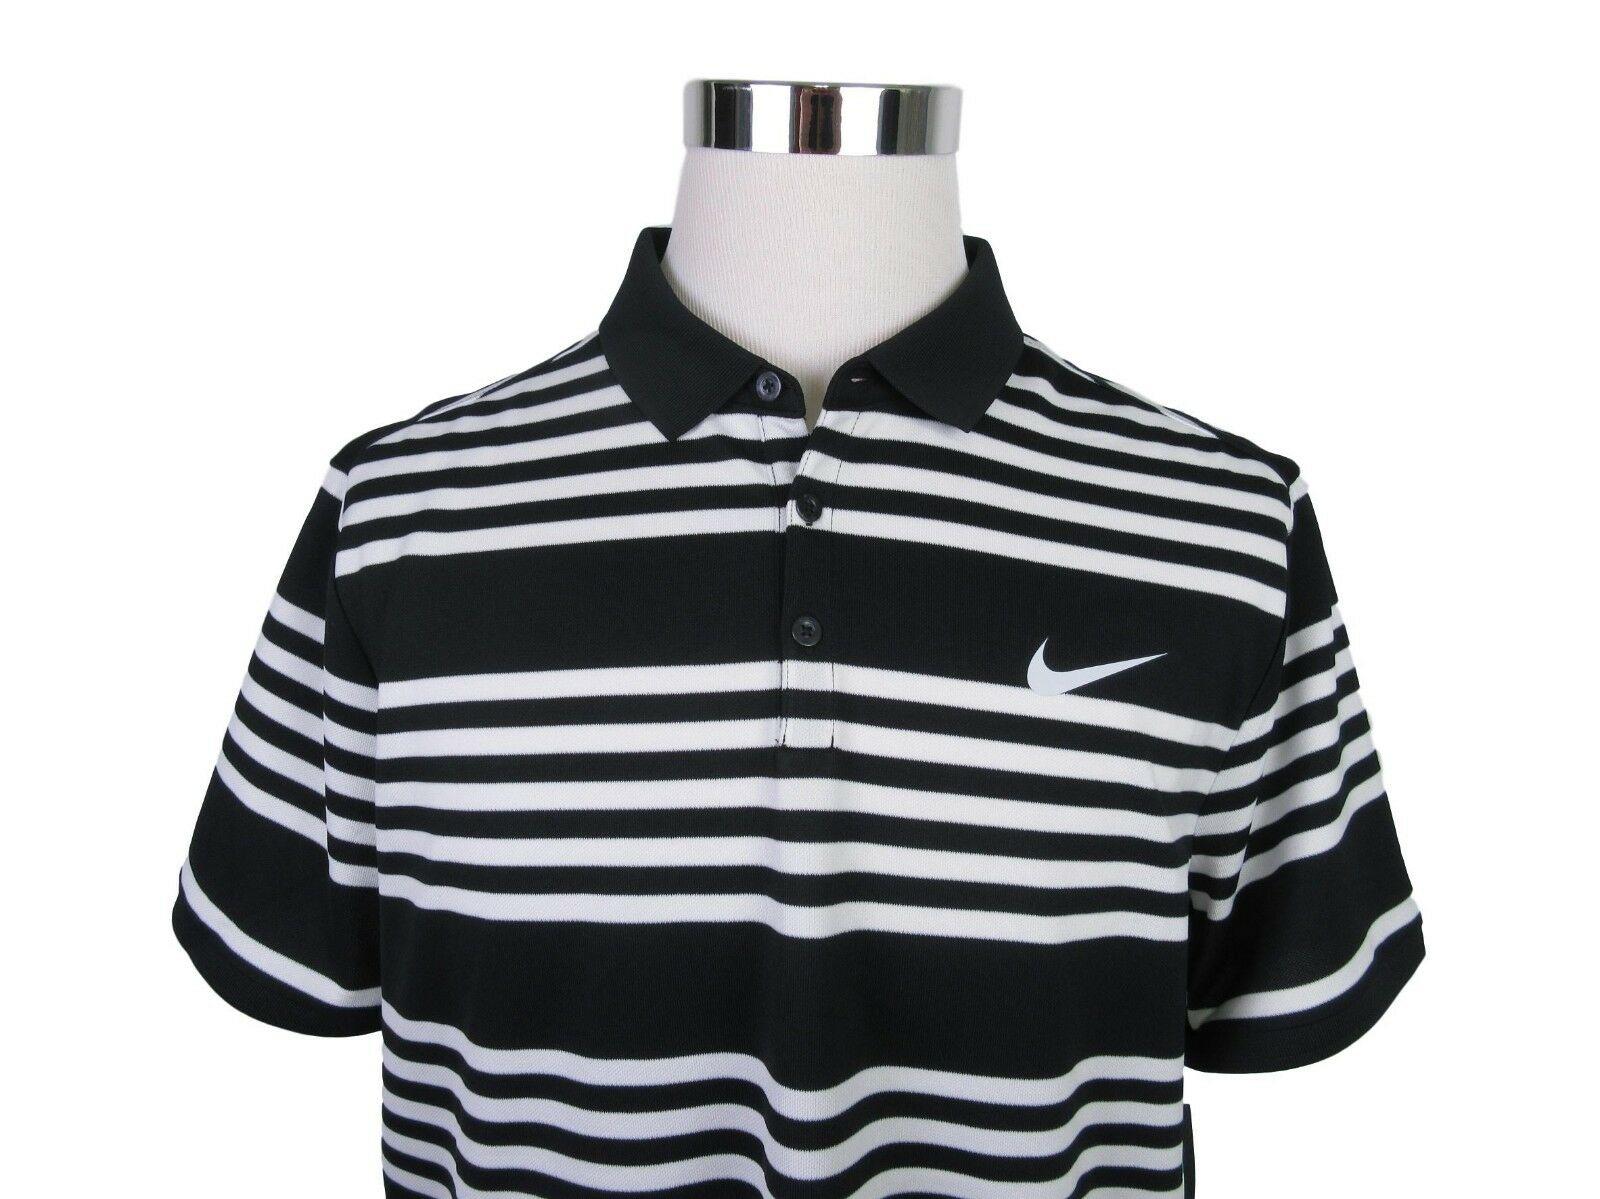 3248bb86f4 Nike Dri-Fit Court Dry Black White Striped Polo Shirt Size XL Mens ...